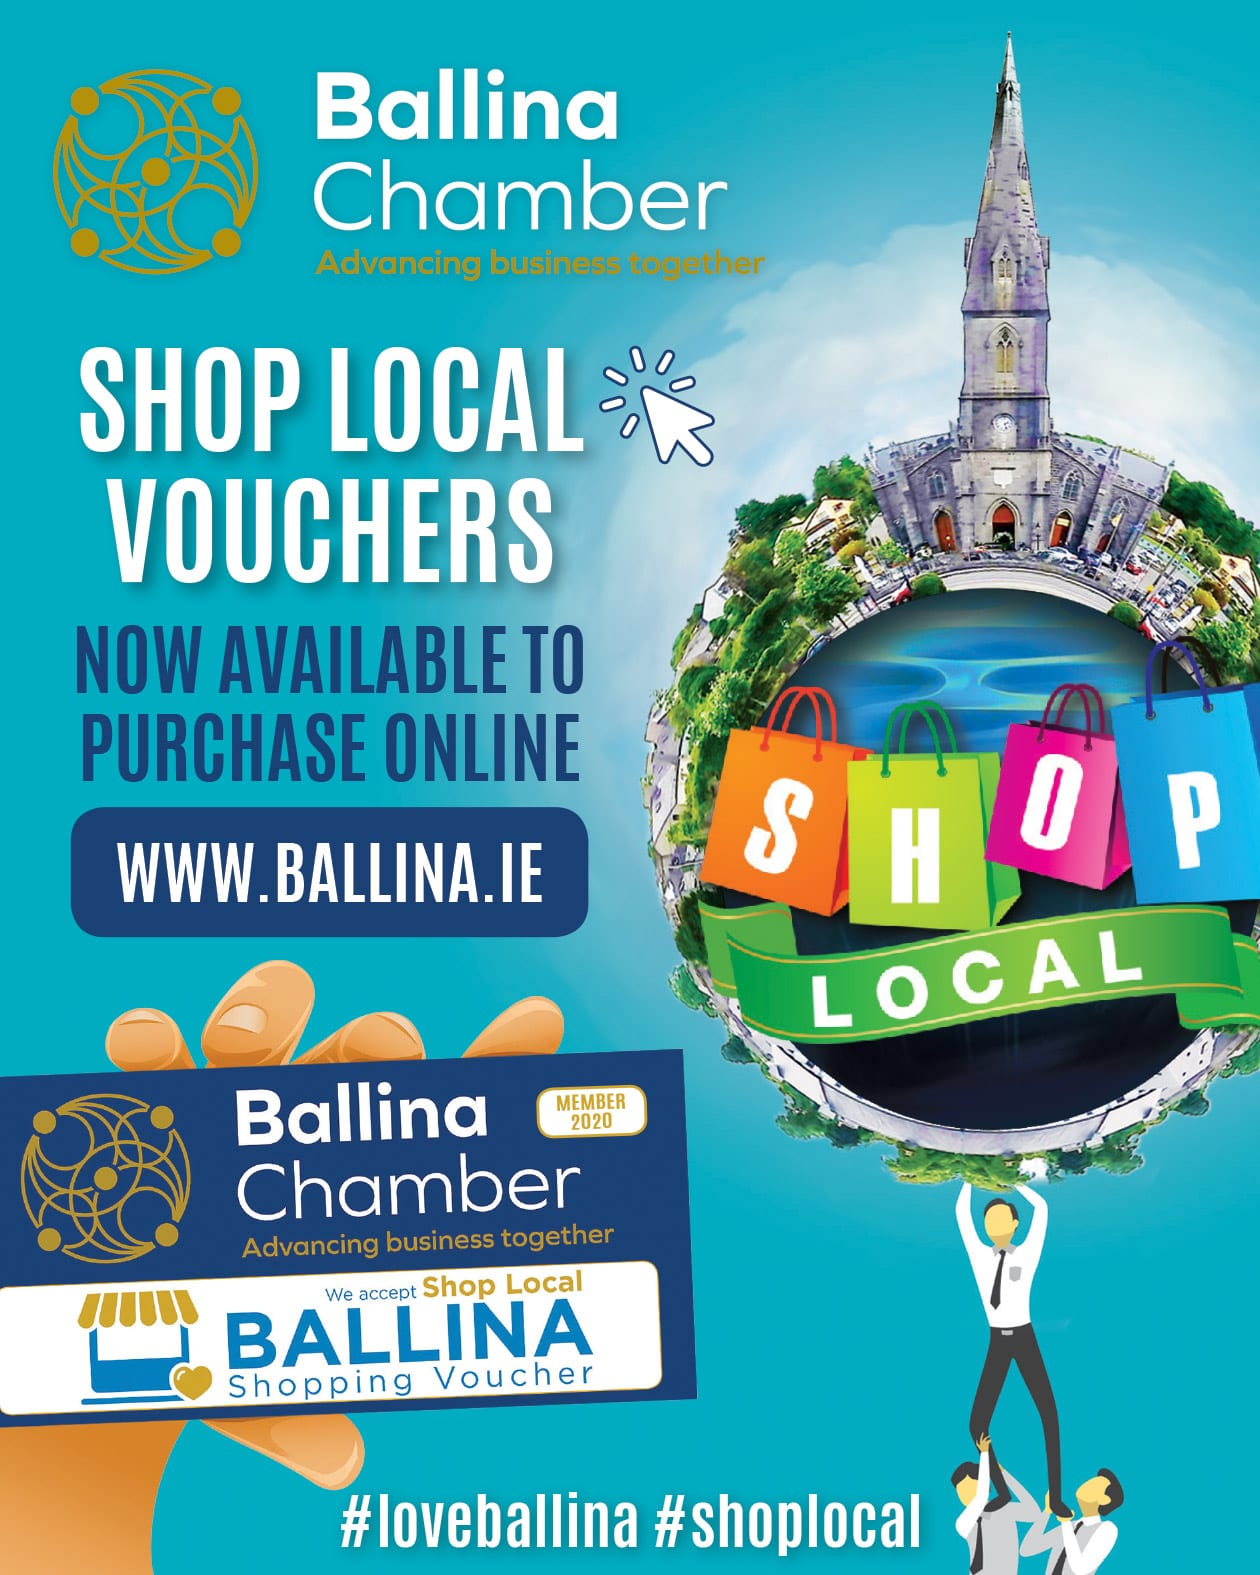 Ballina-Chamber-Voucher